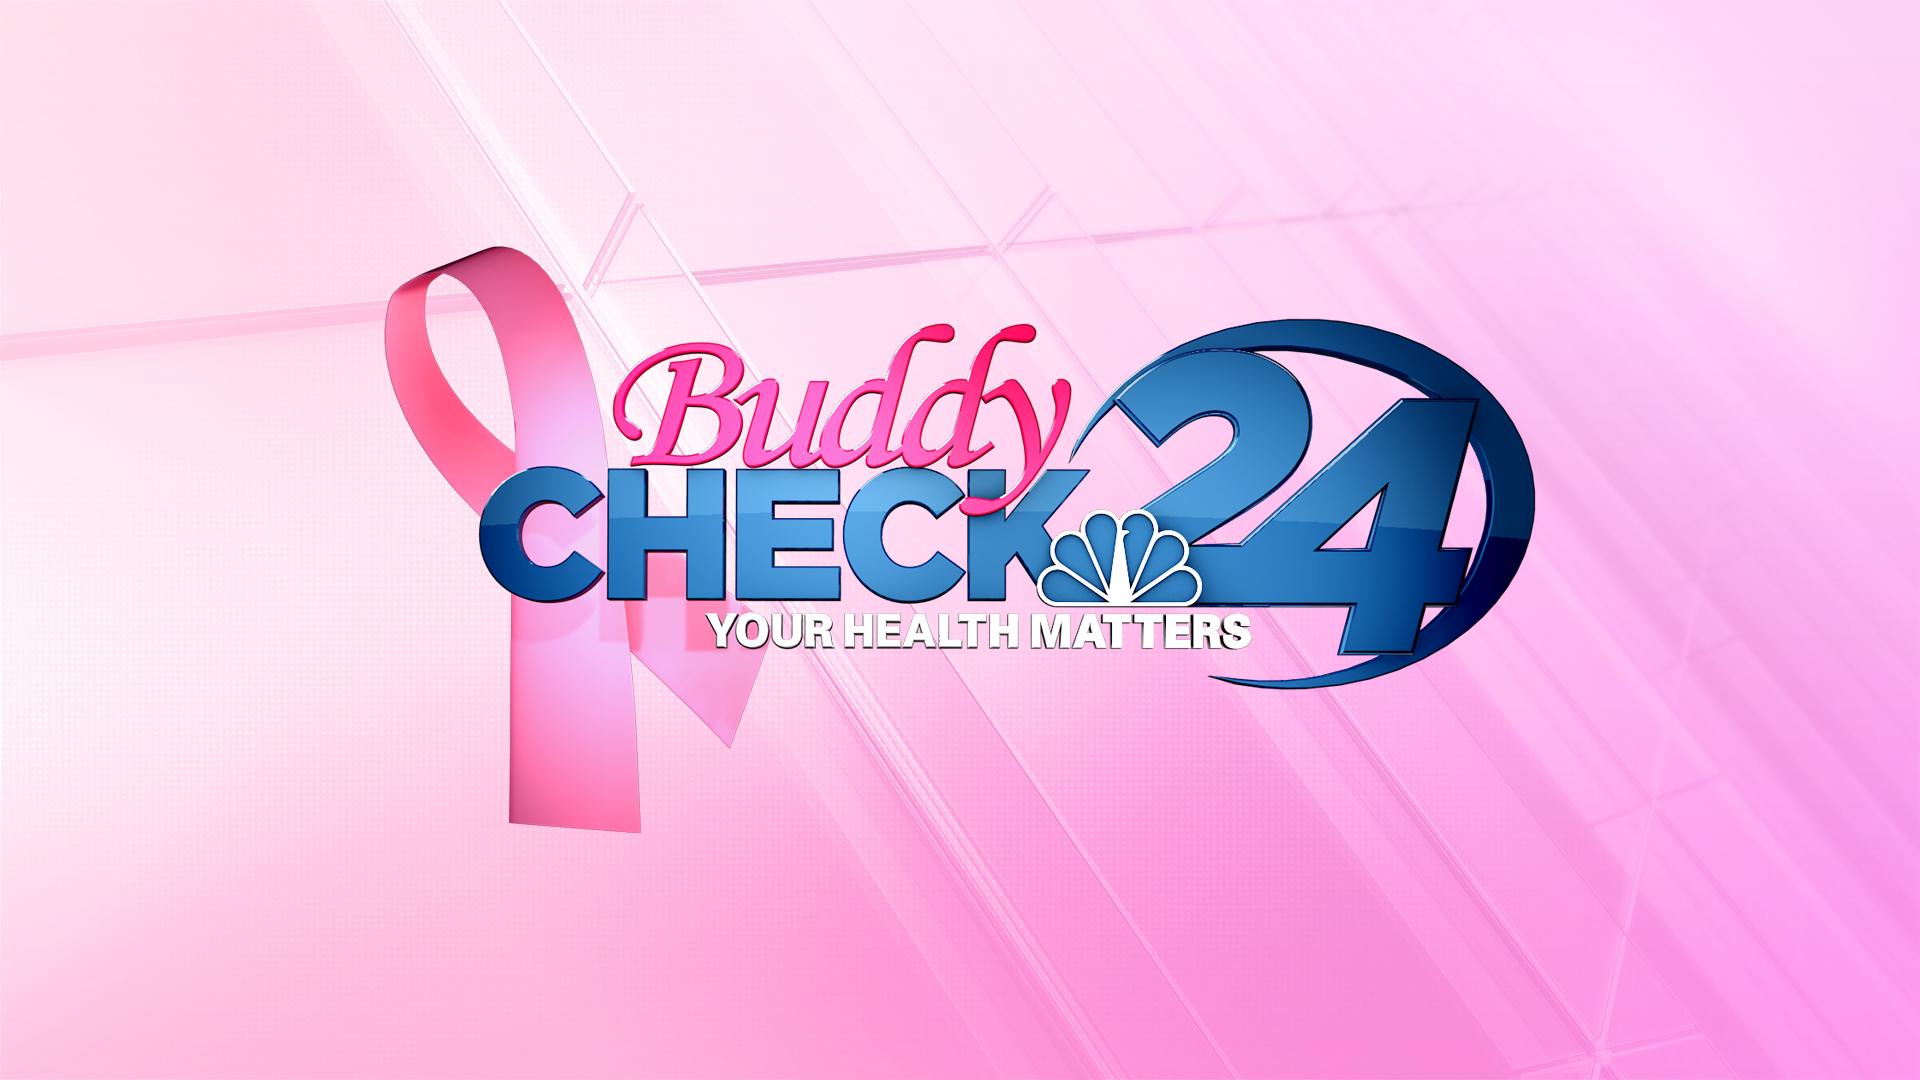 buddy-check_1537833023519.jpg